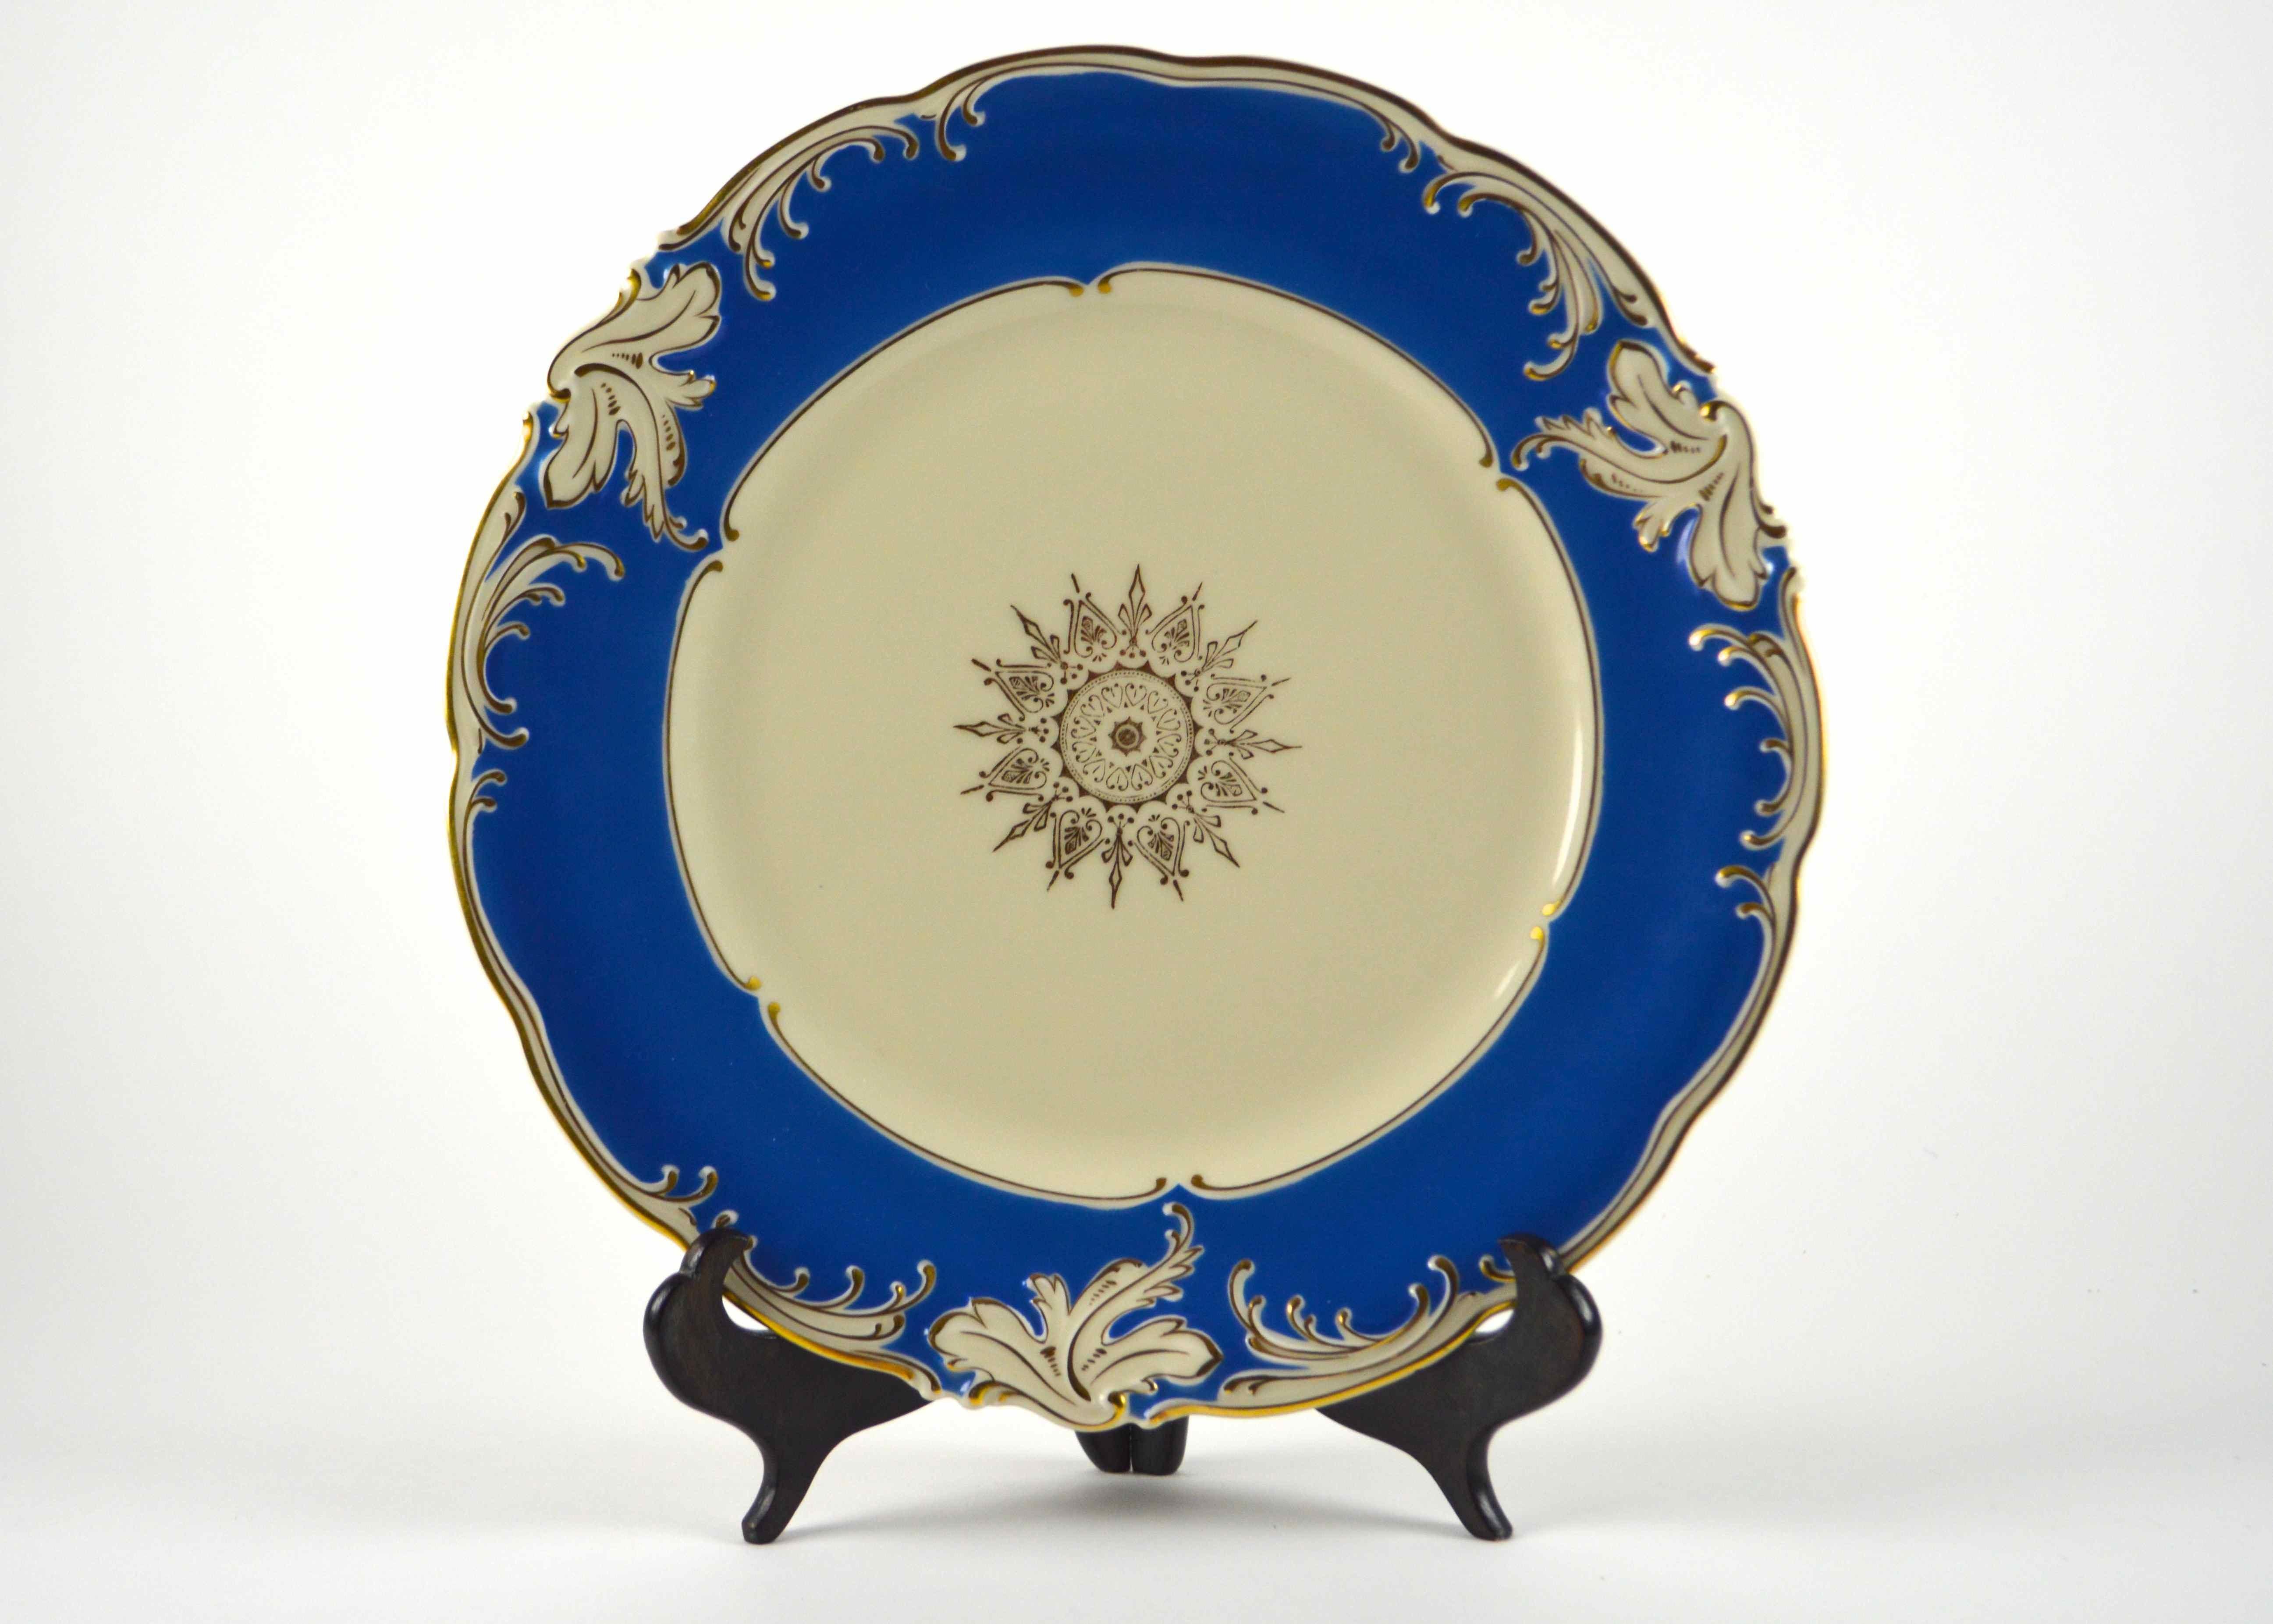 Stunning Set of Twelve Hand-Painted, Gold Trim German Porcelain Plates